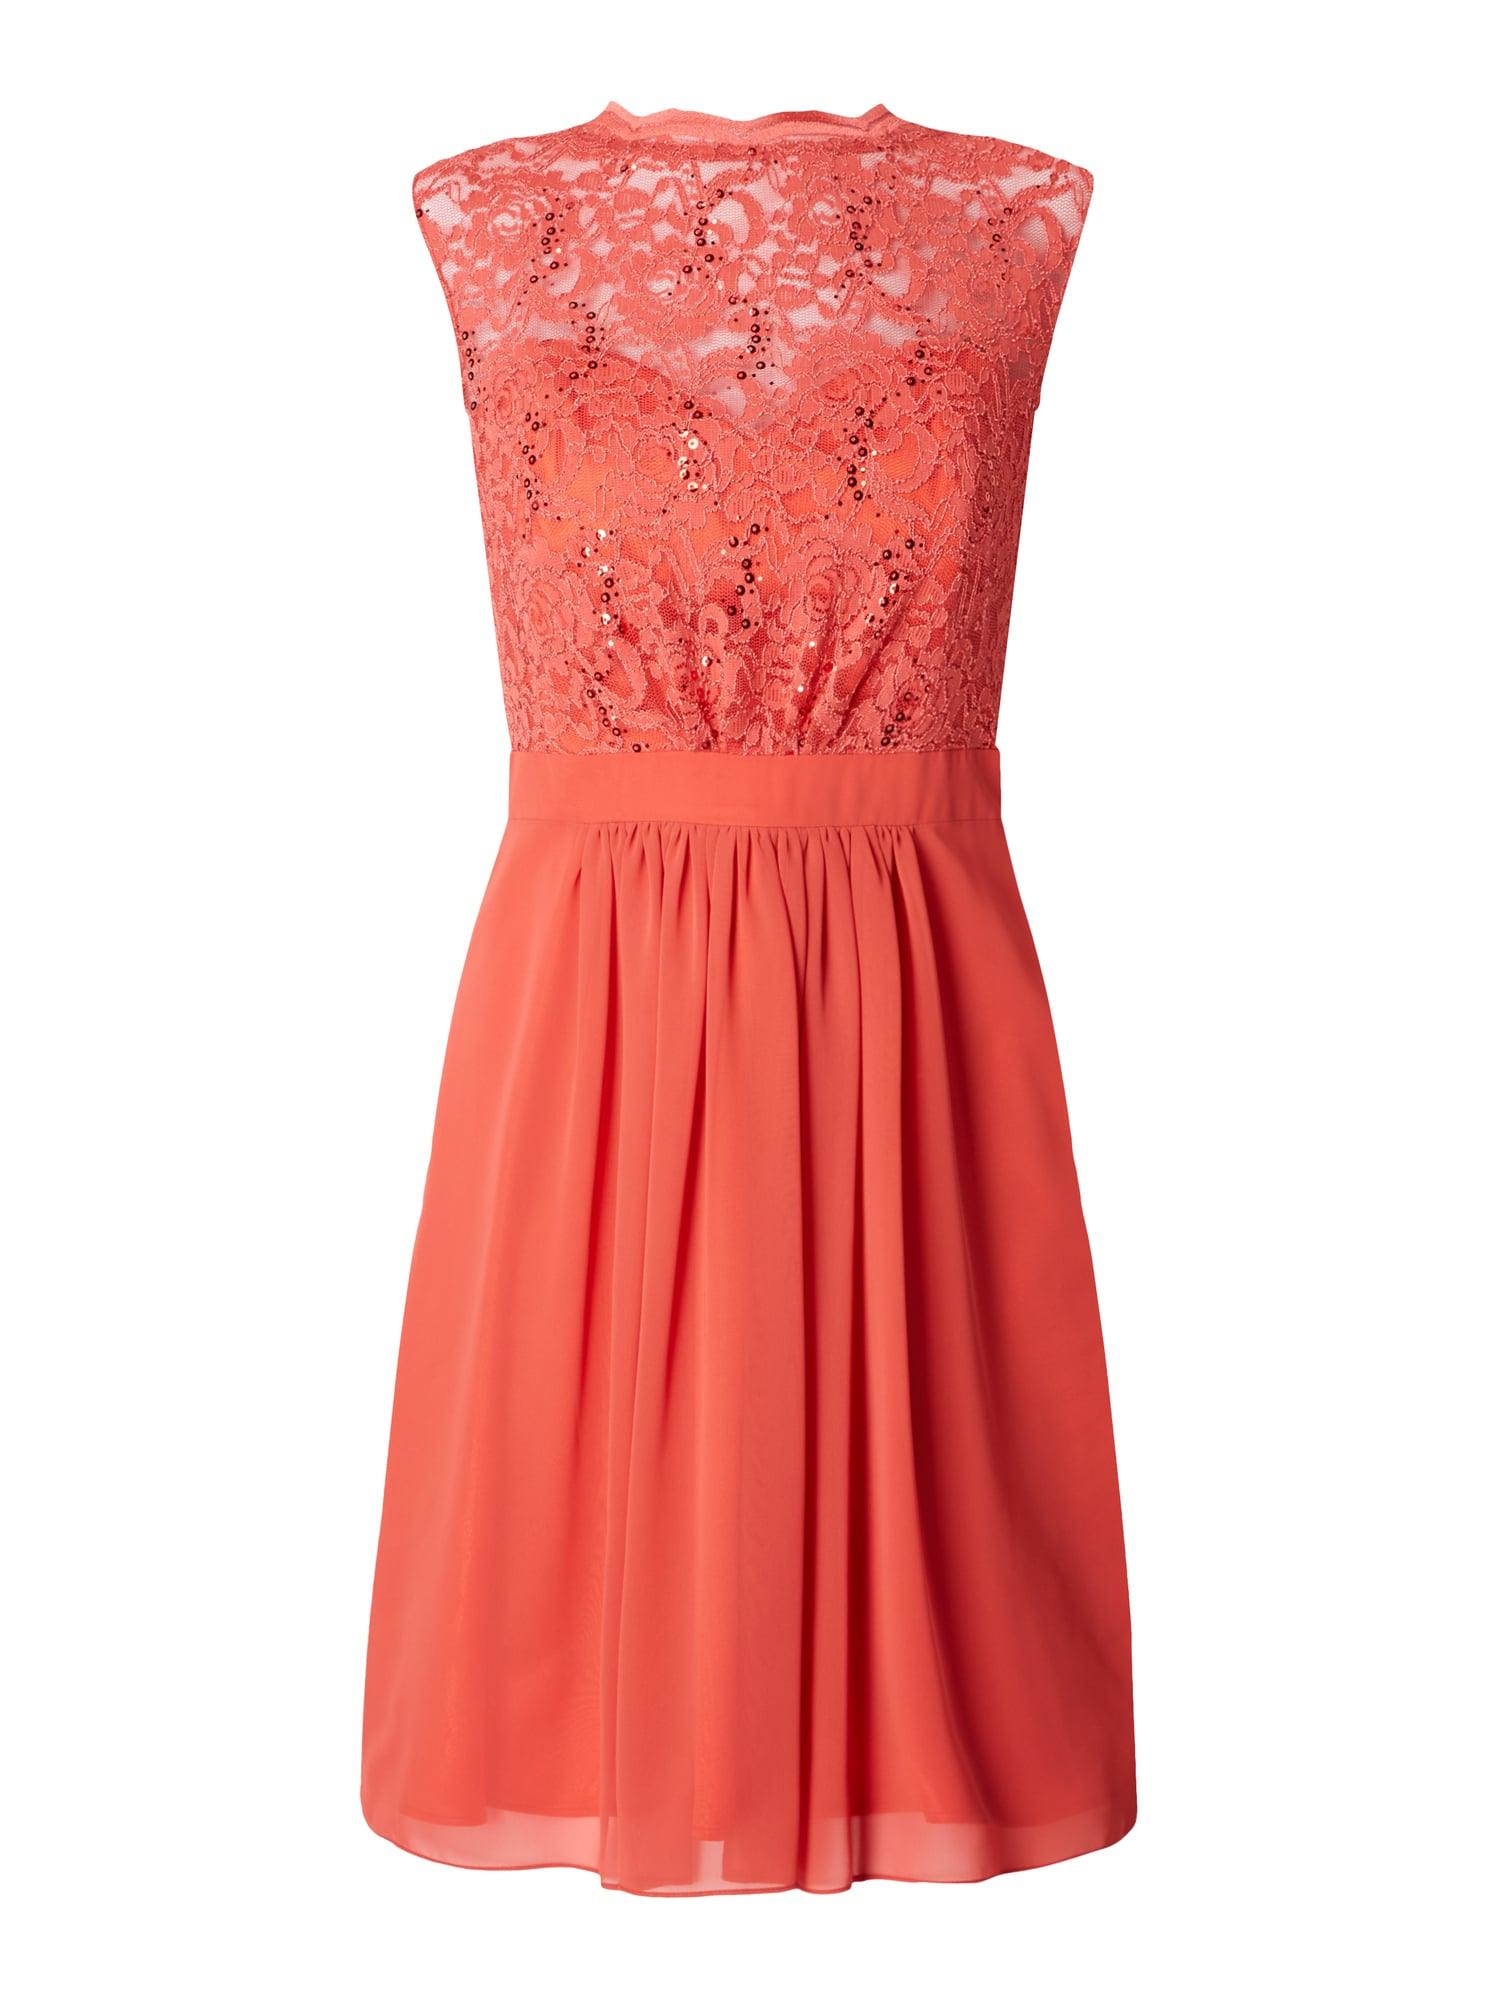 Formal Top Kleid Koralle Spitze Ärmel15 Kreativ Kleid Koralle Spitze Spezialgebiet